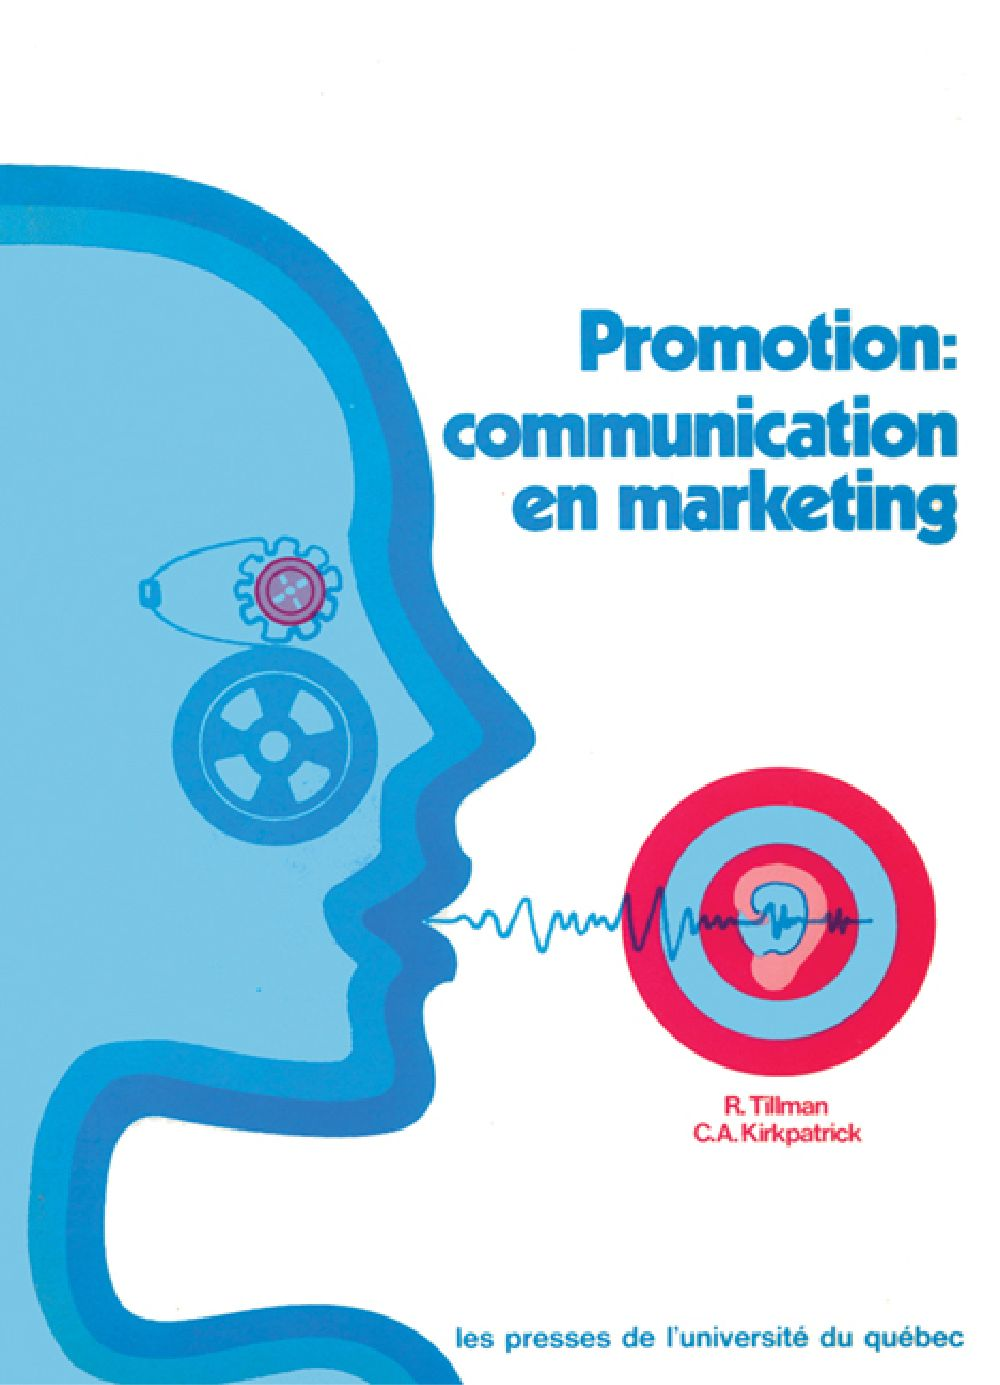 Promotion communication en marketing